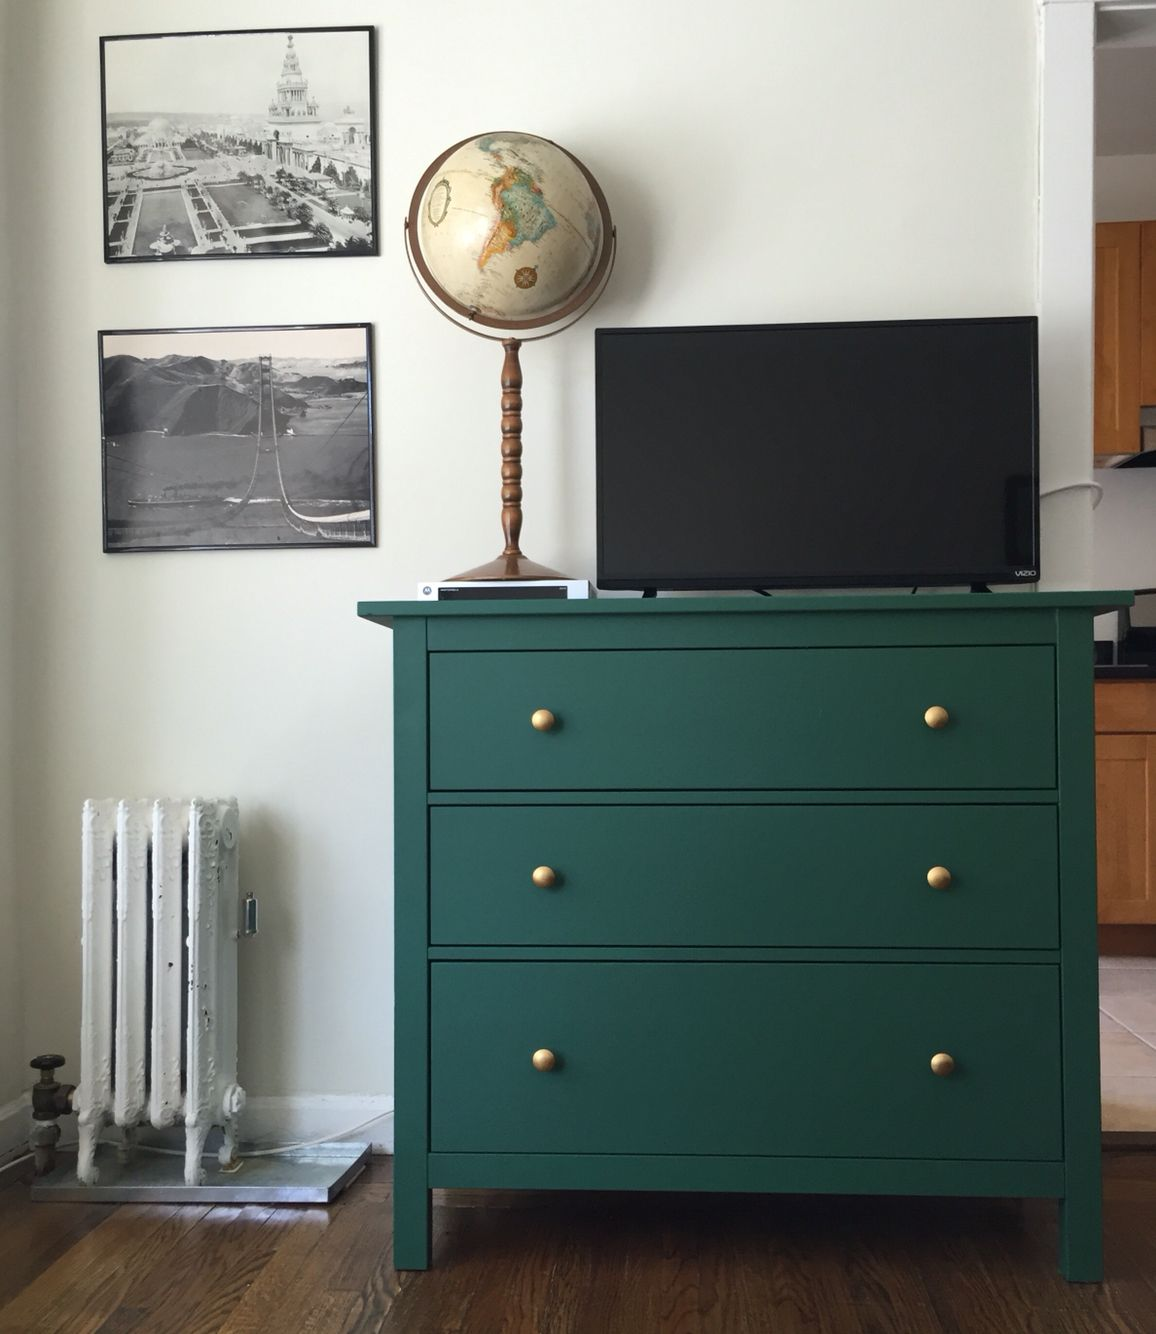 Ikea Hemnes Dresser Hack Chalkboard Green Ikea Hemnes Dresser